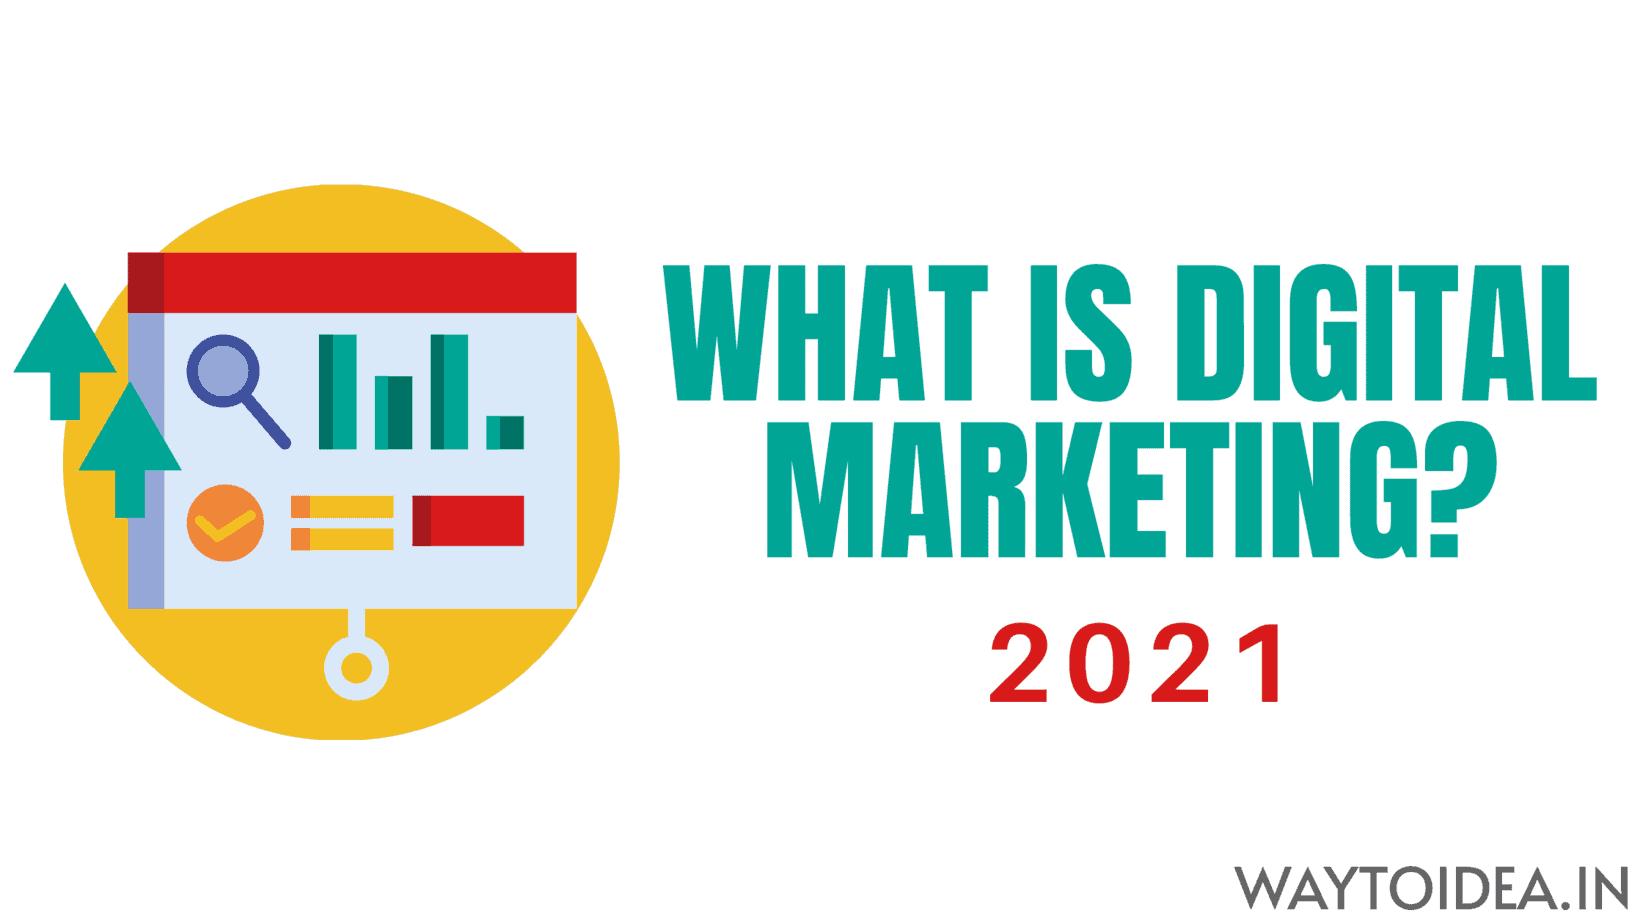 What is Digital Marketing 2021